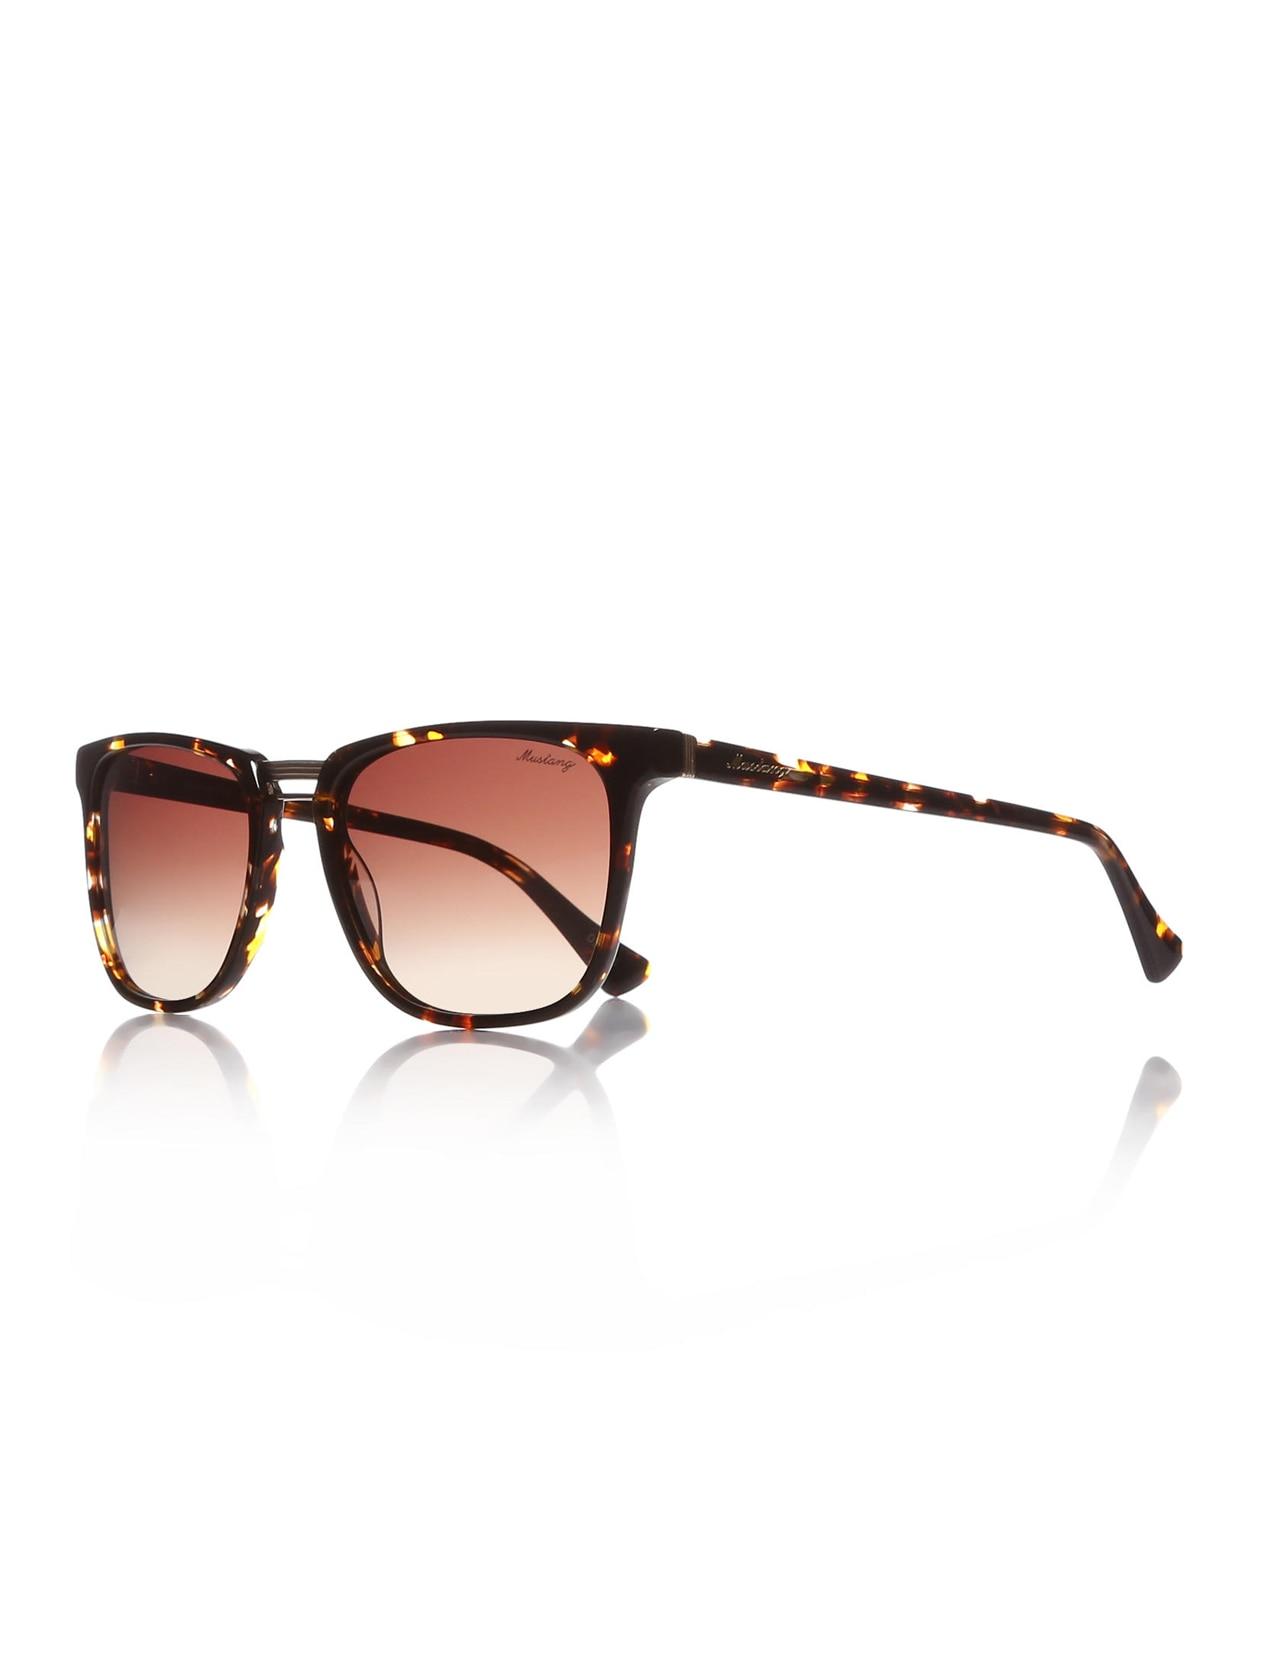 Unisex sunglasses mu 1518 03 bone Brown unspecified 56 -- mustang